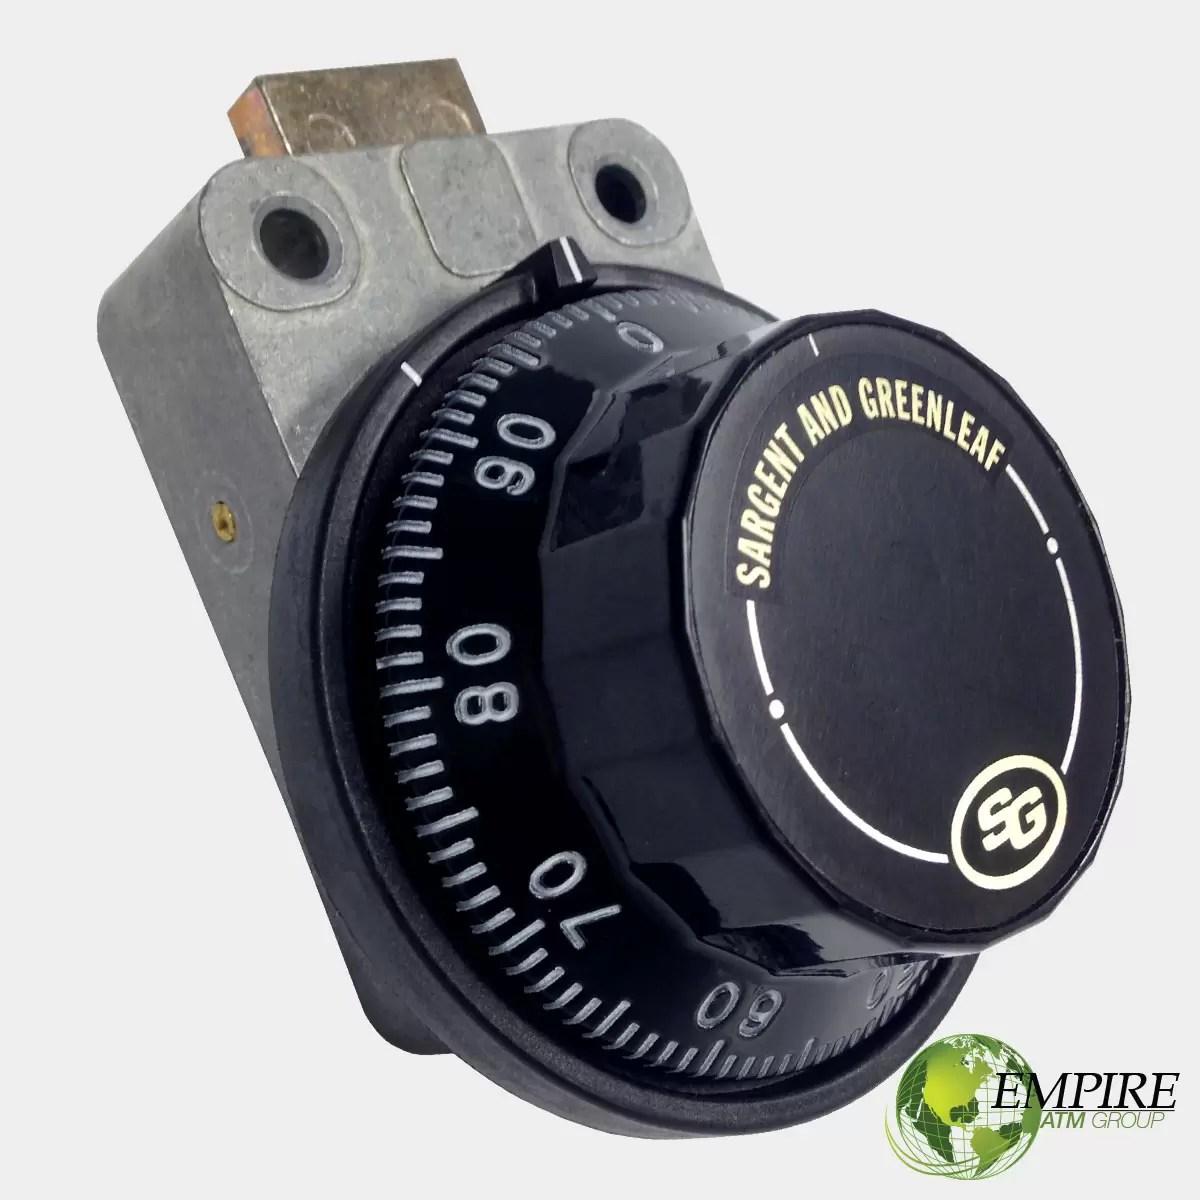 Universal Dial Lock